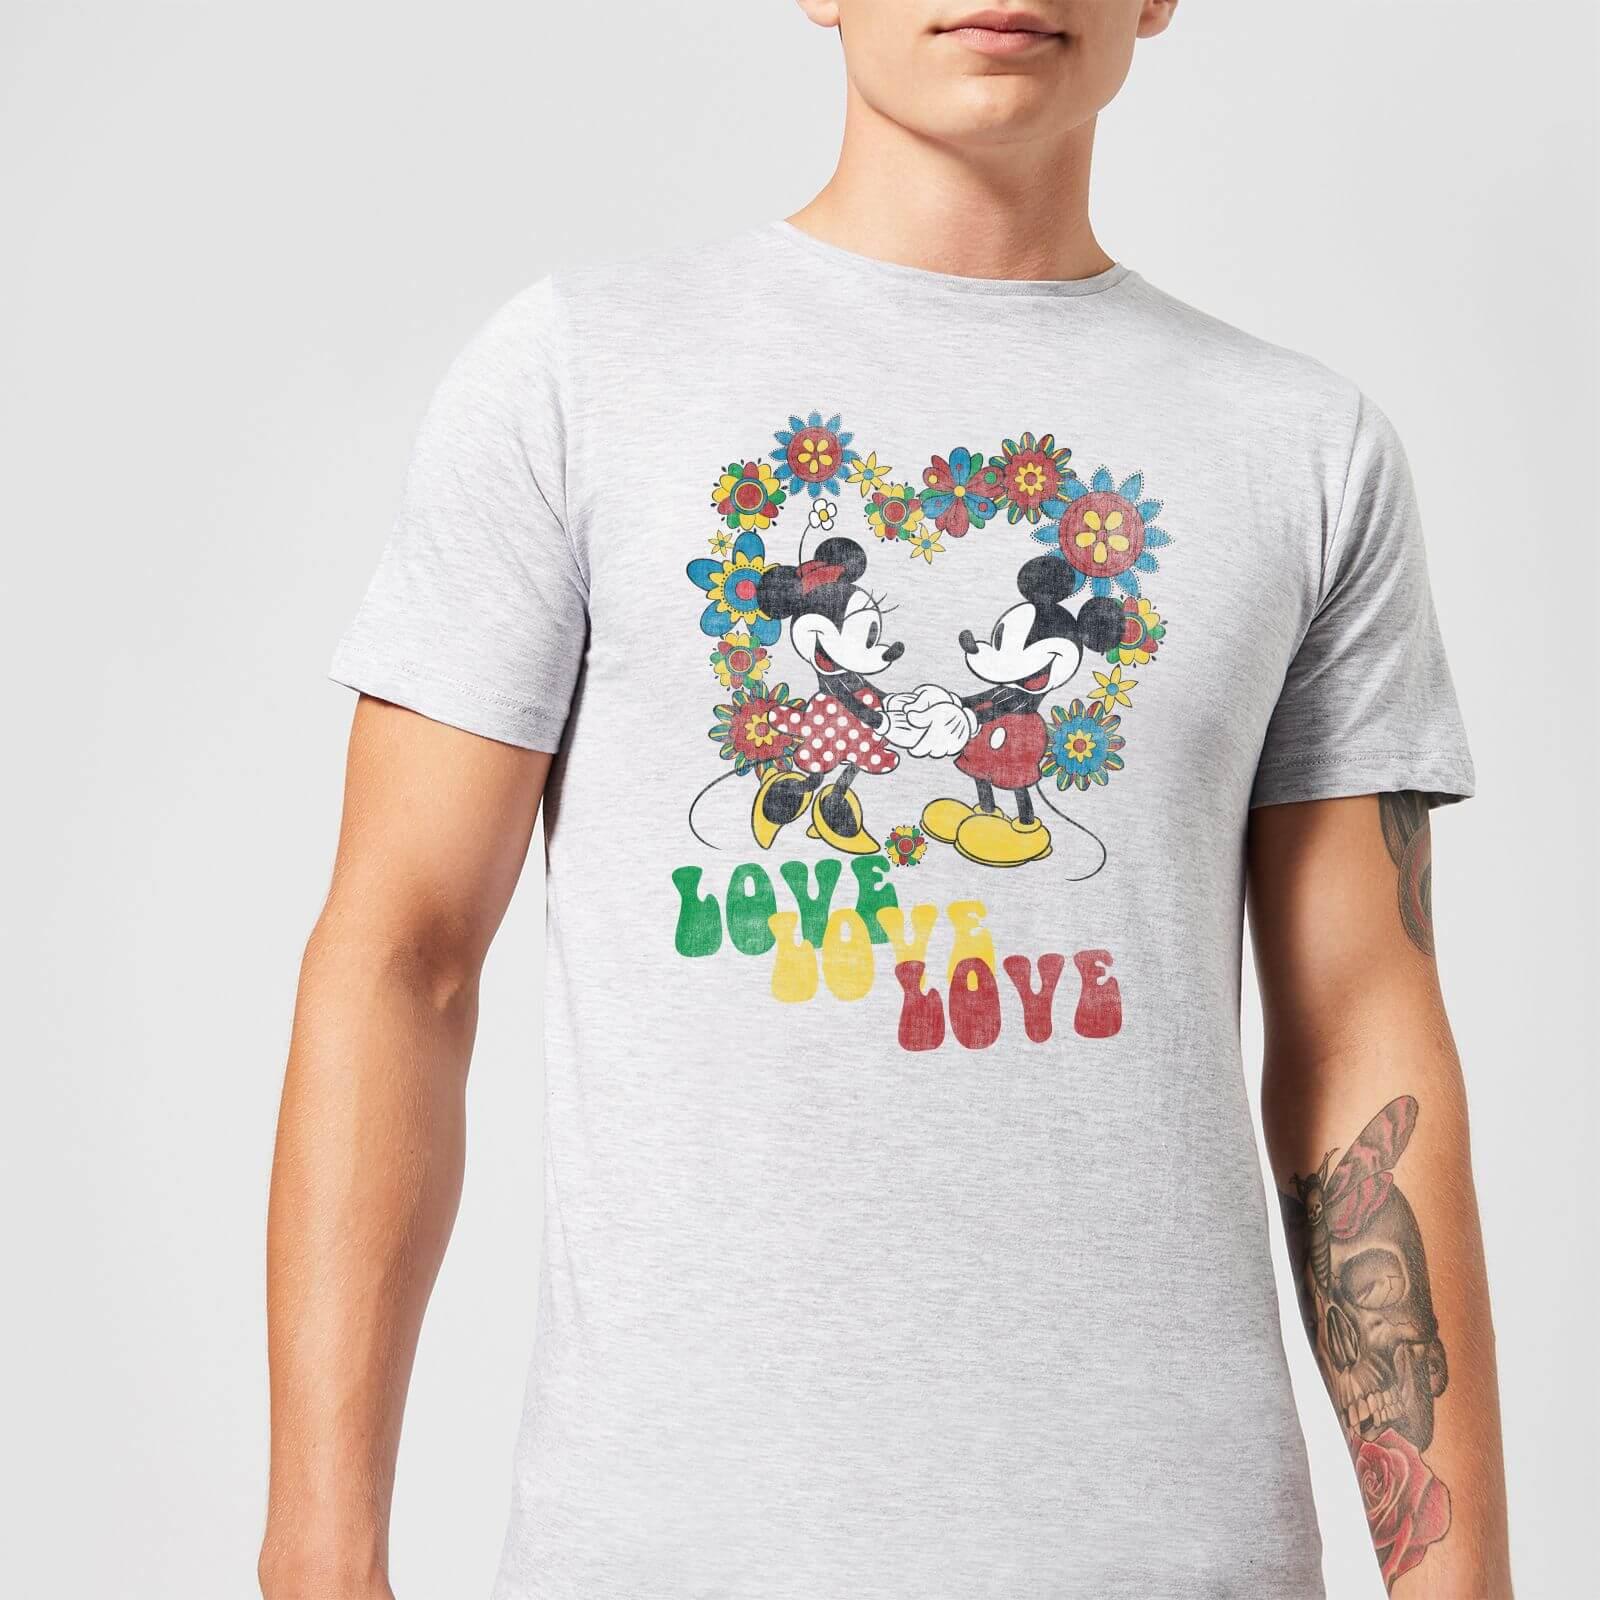 Disney Mickey Mouse Hippie Love T-Shirt - Grey - L - Black